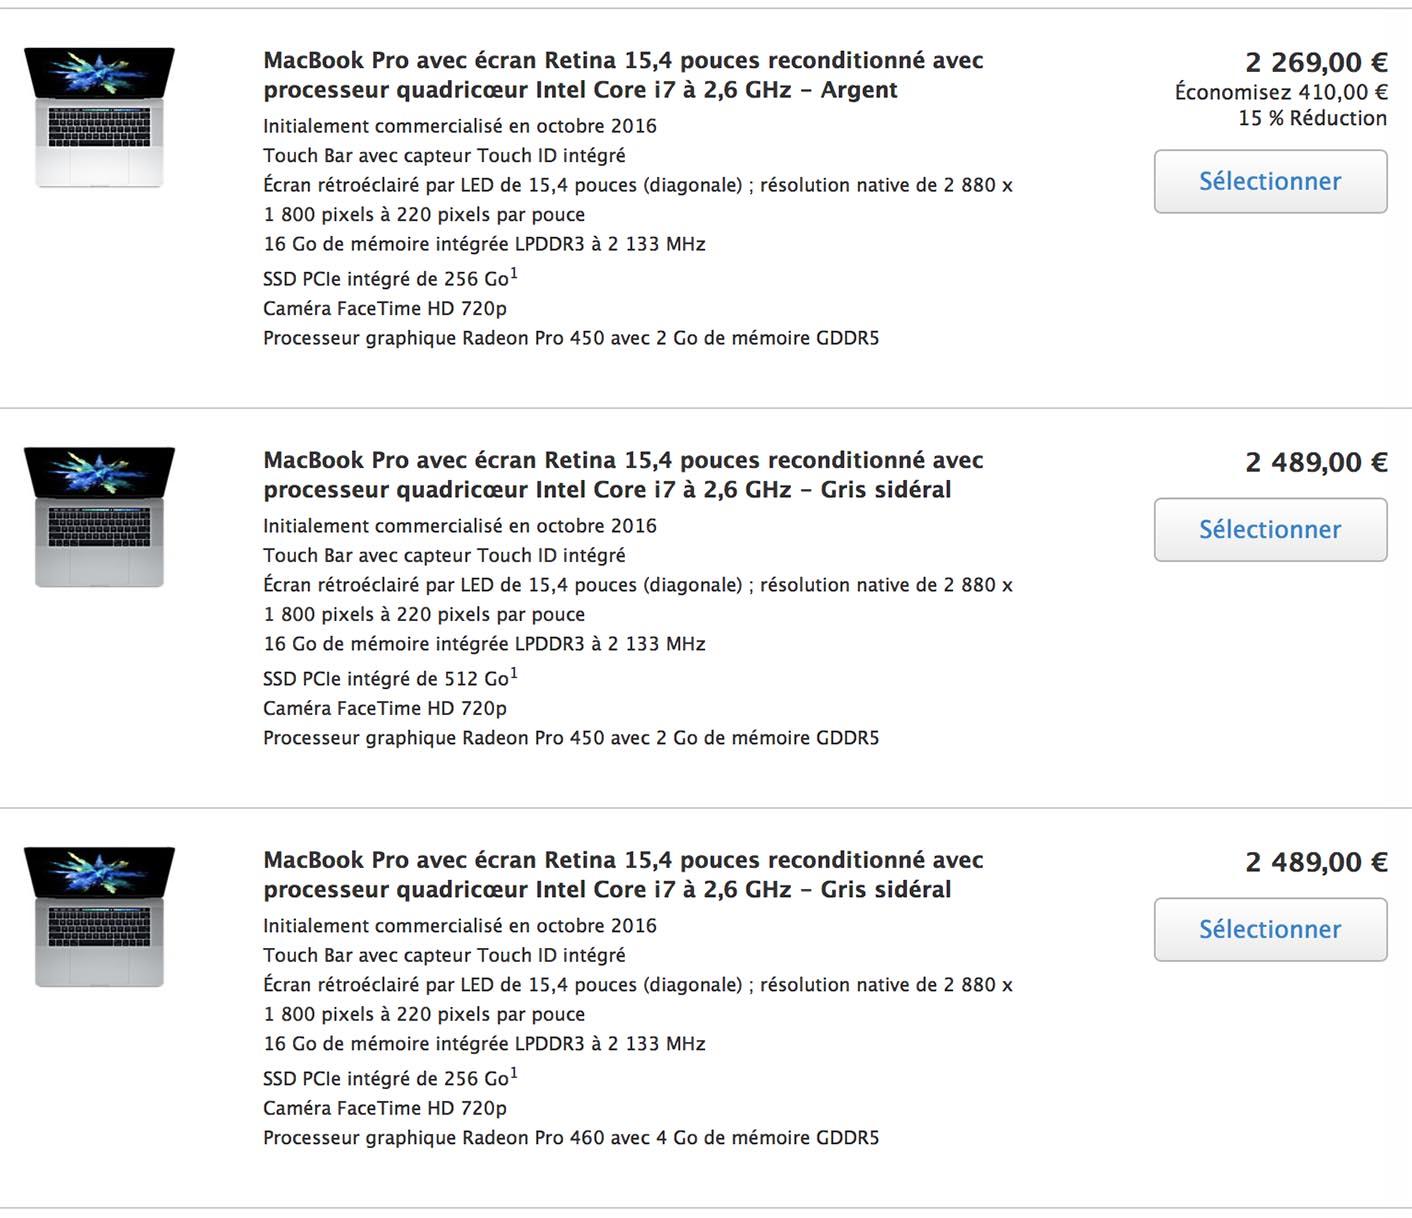 MacBook Pro 13 Refurb juin 2017